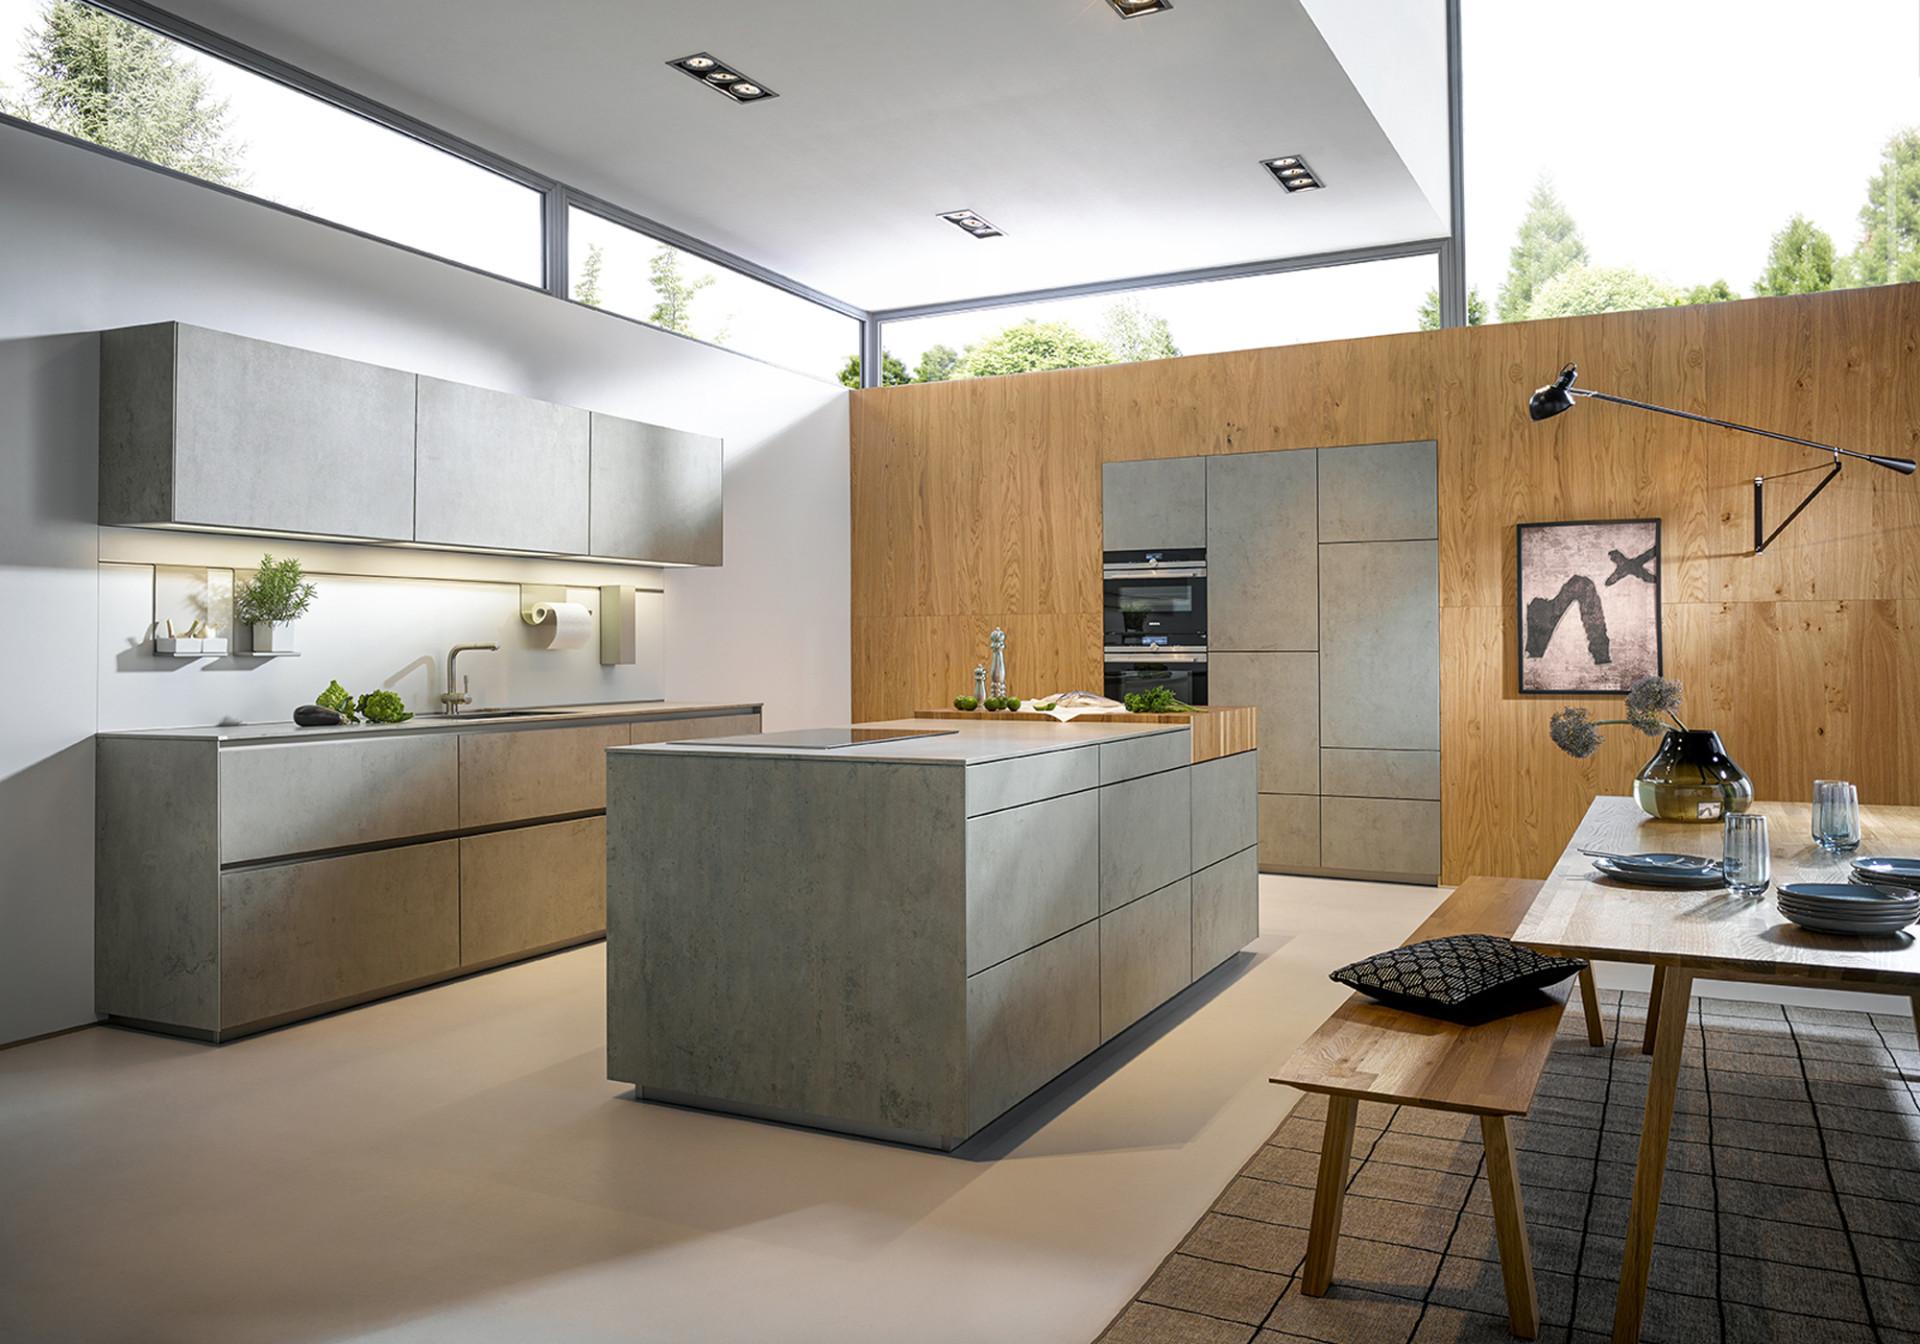 Кухня «Гнейс» пластиковые фасады под камень